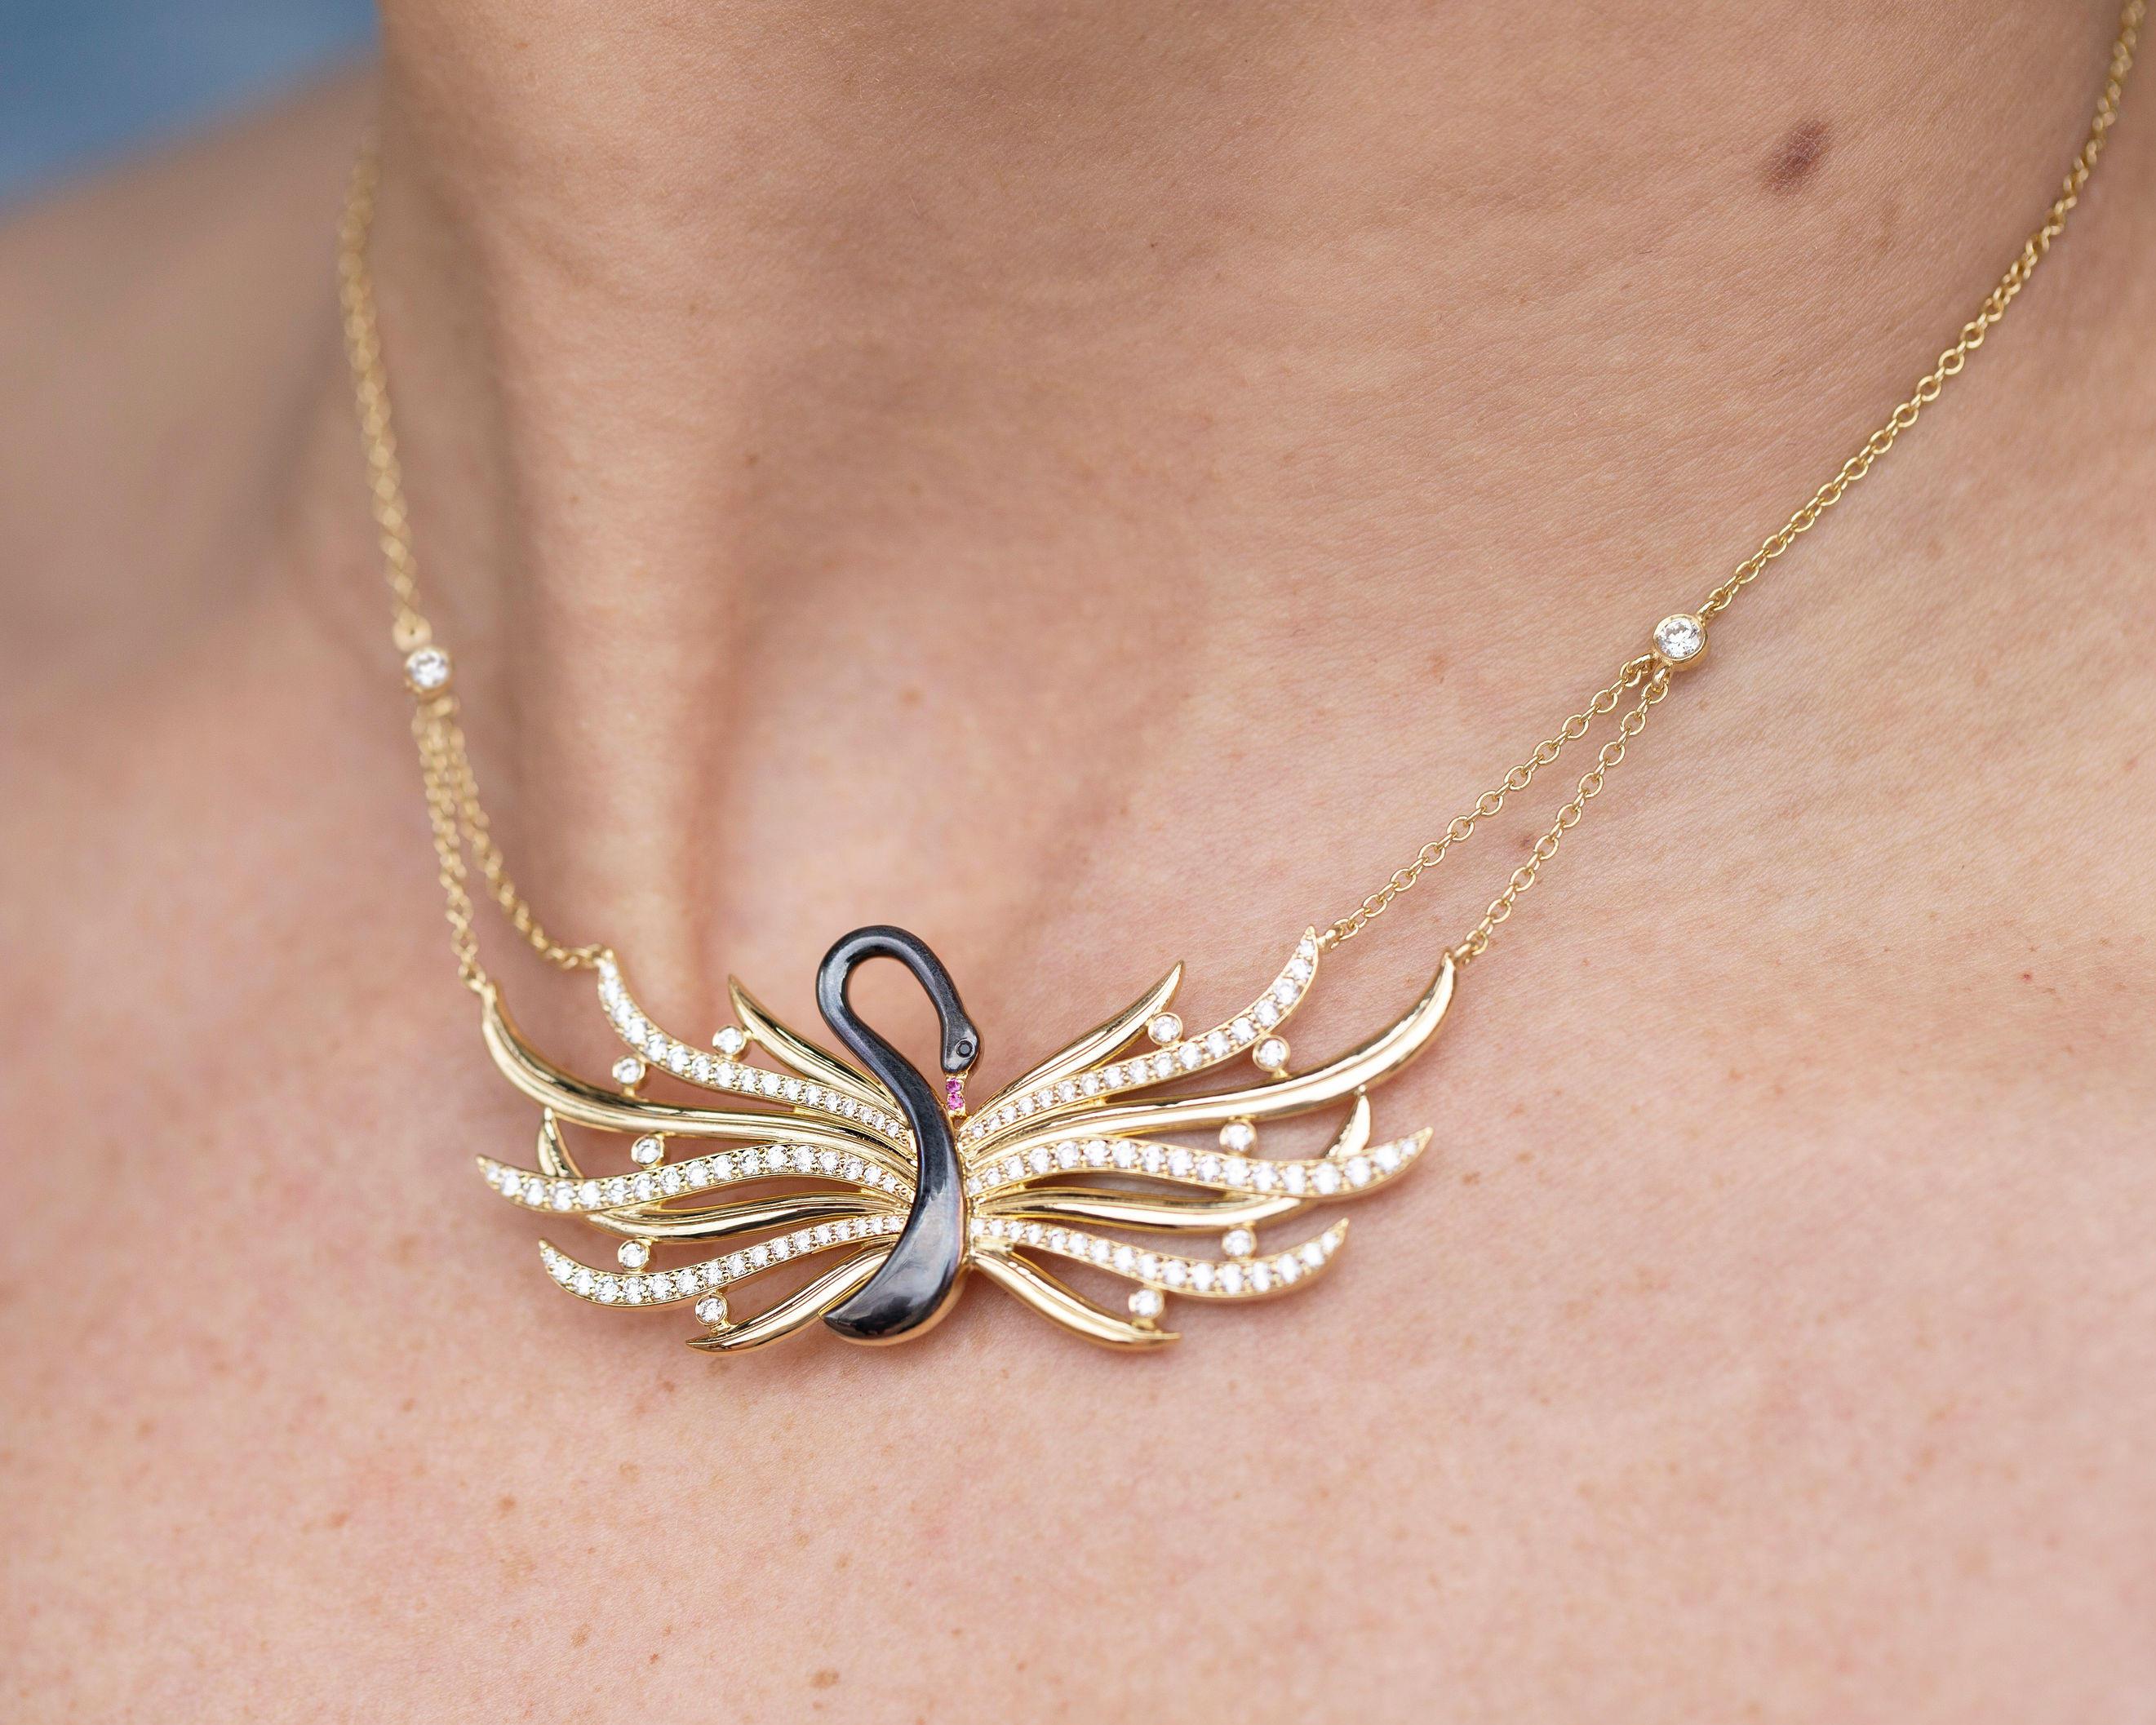 Bailey's Fine Jewelry image 1